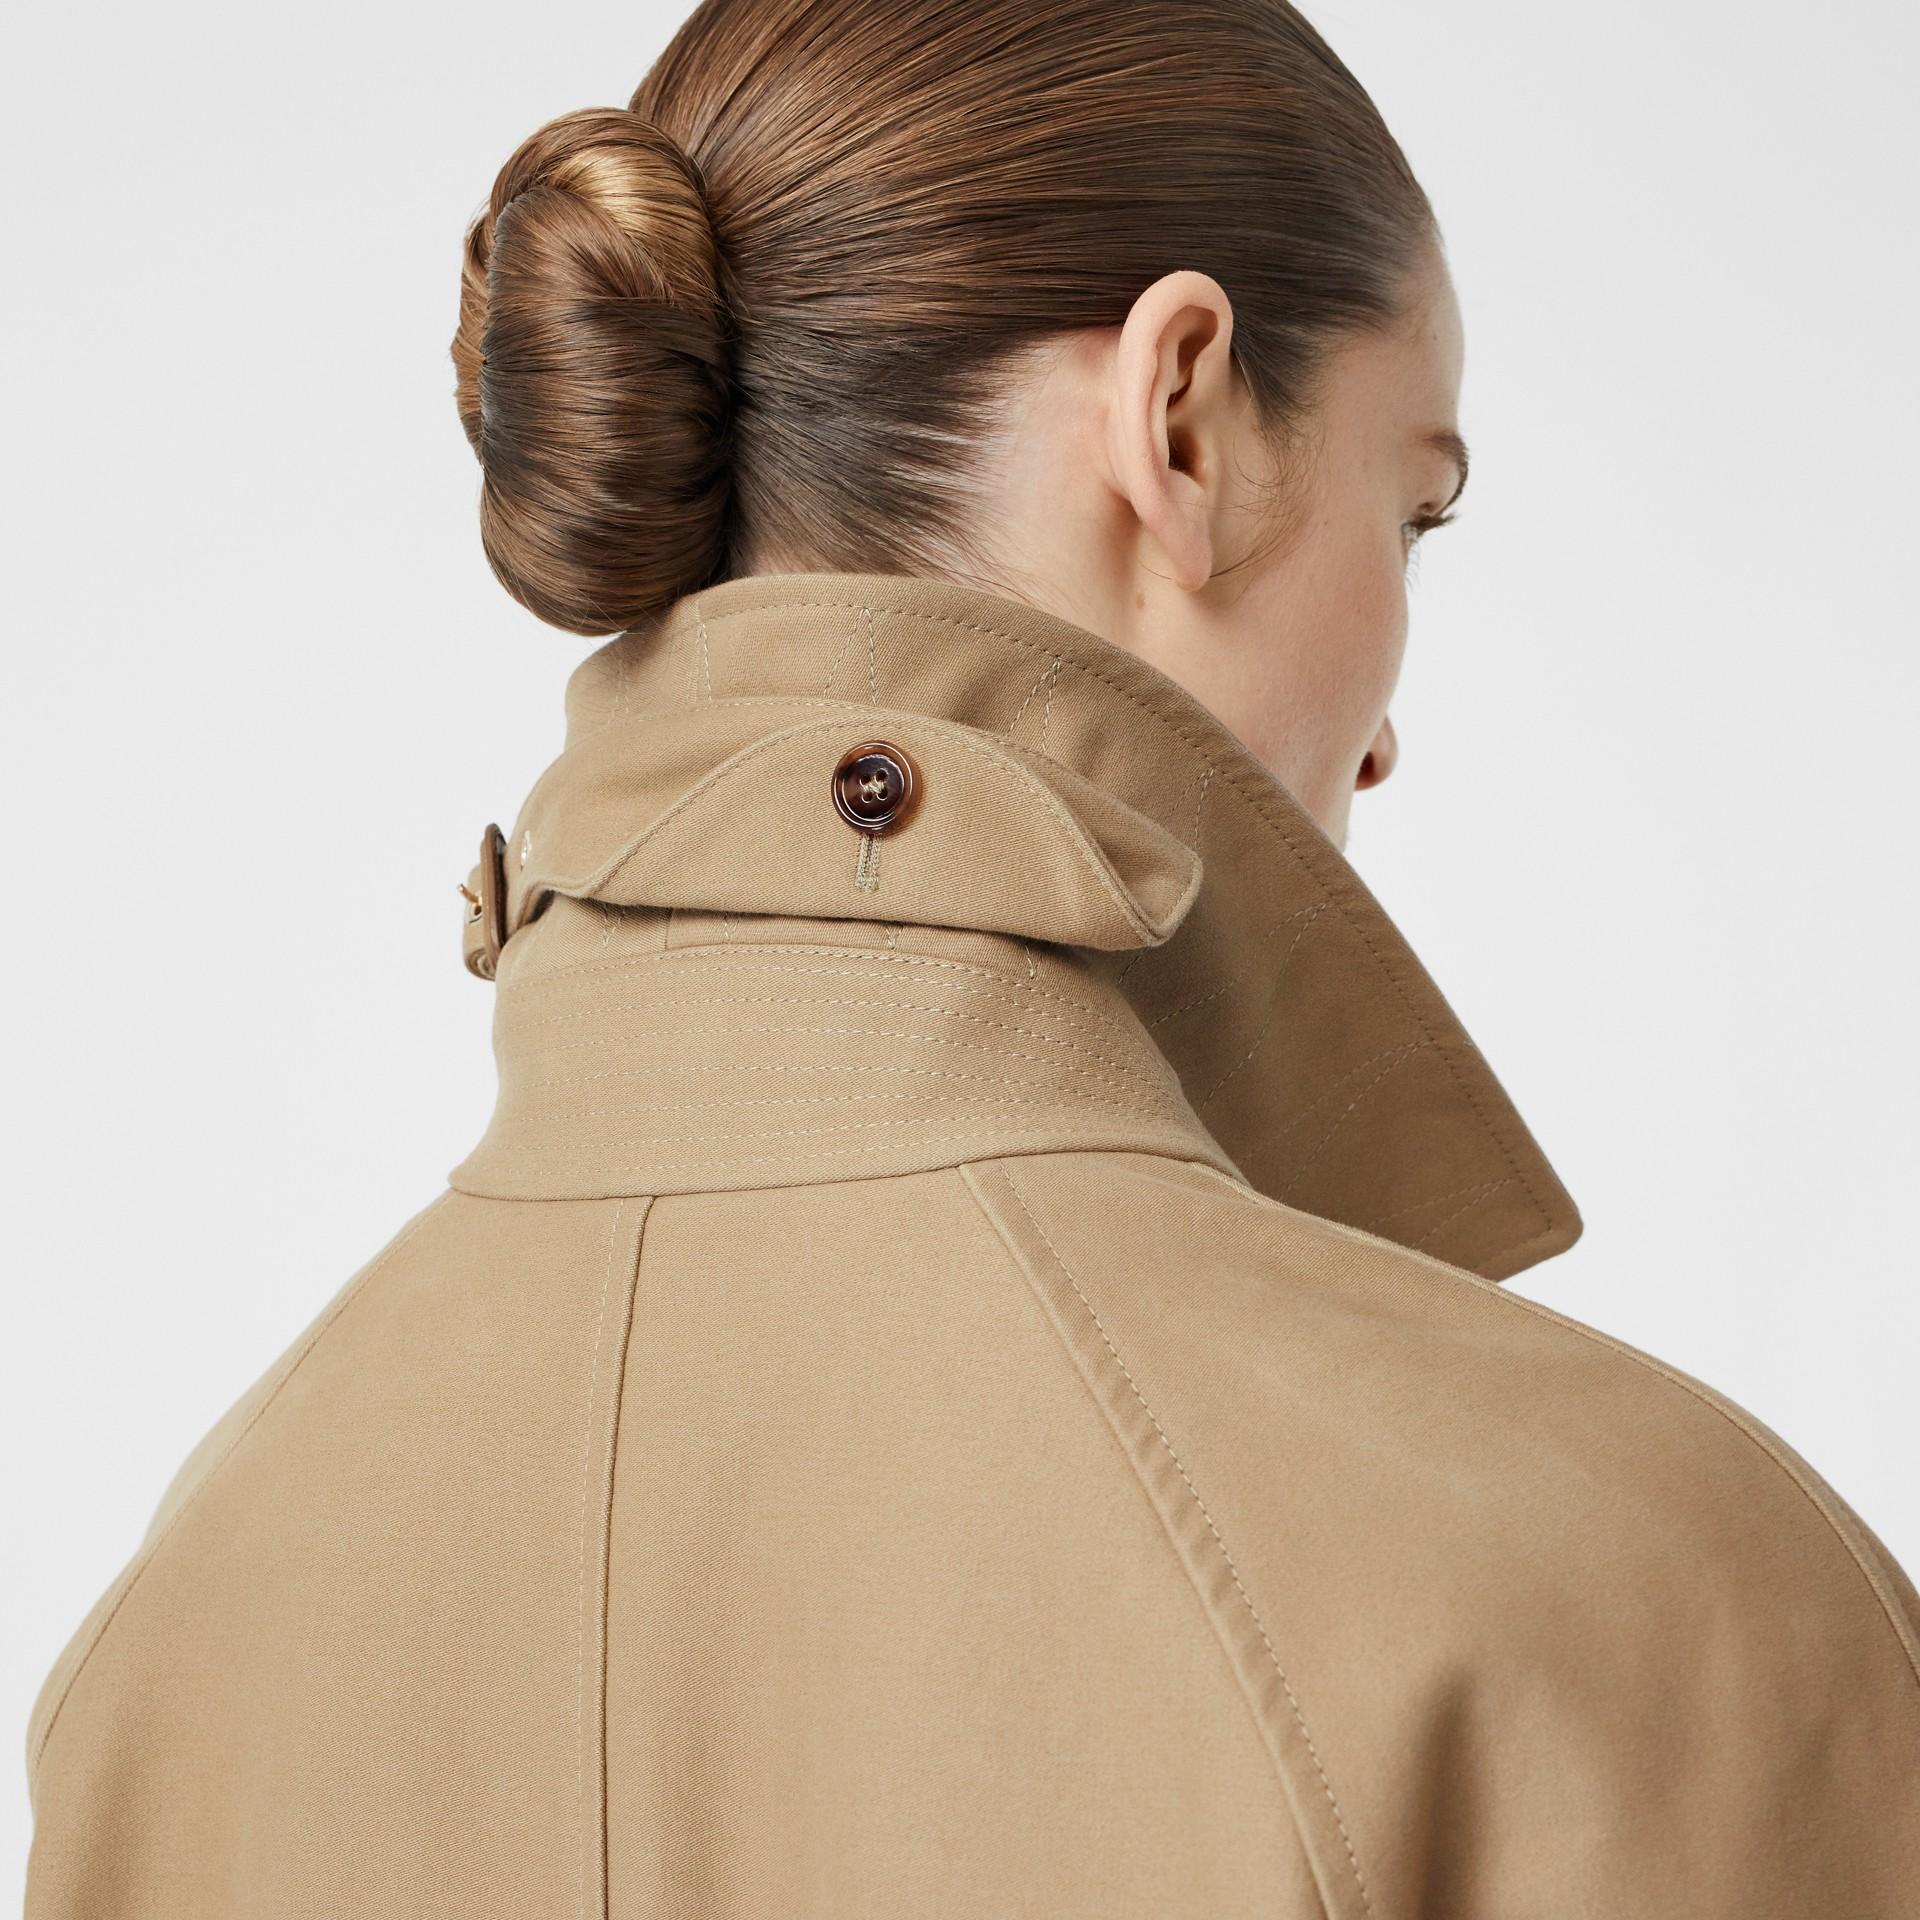 Scarf Detail Cotton Gabardine Car Coat in Honey - Women | Burberry United Kingdom - gallery image 4